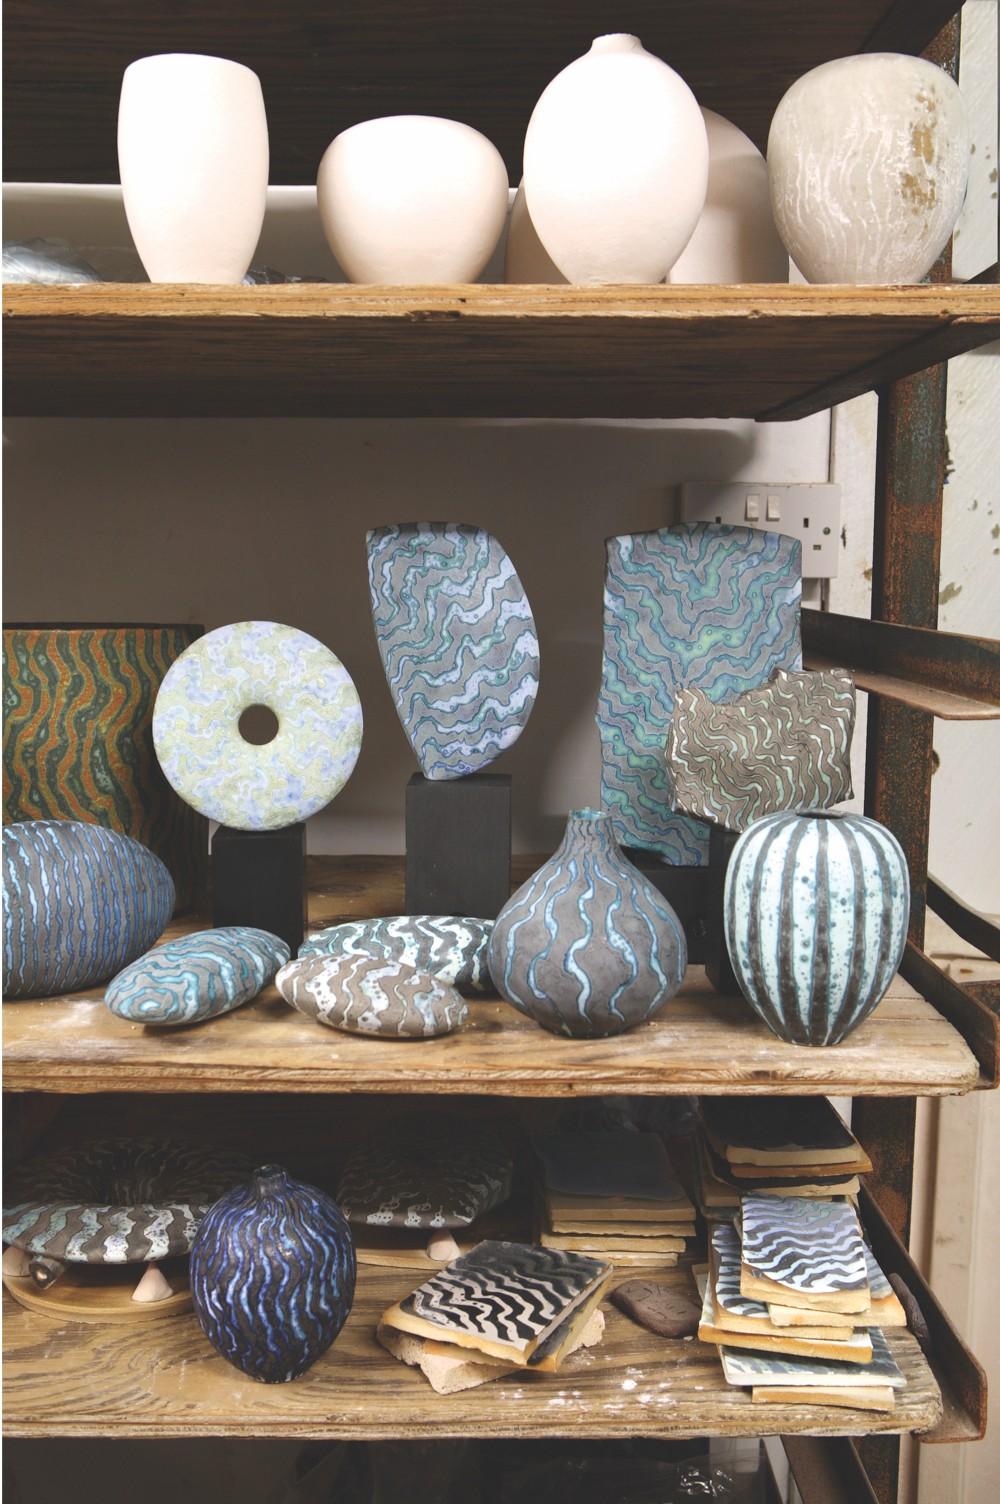 Glazed stoneware pottery by Peter Beard